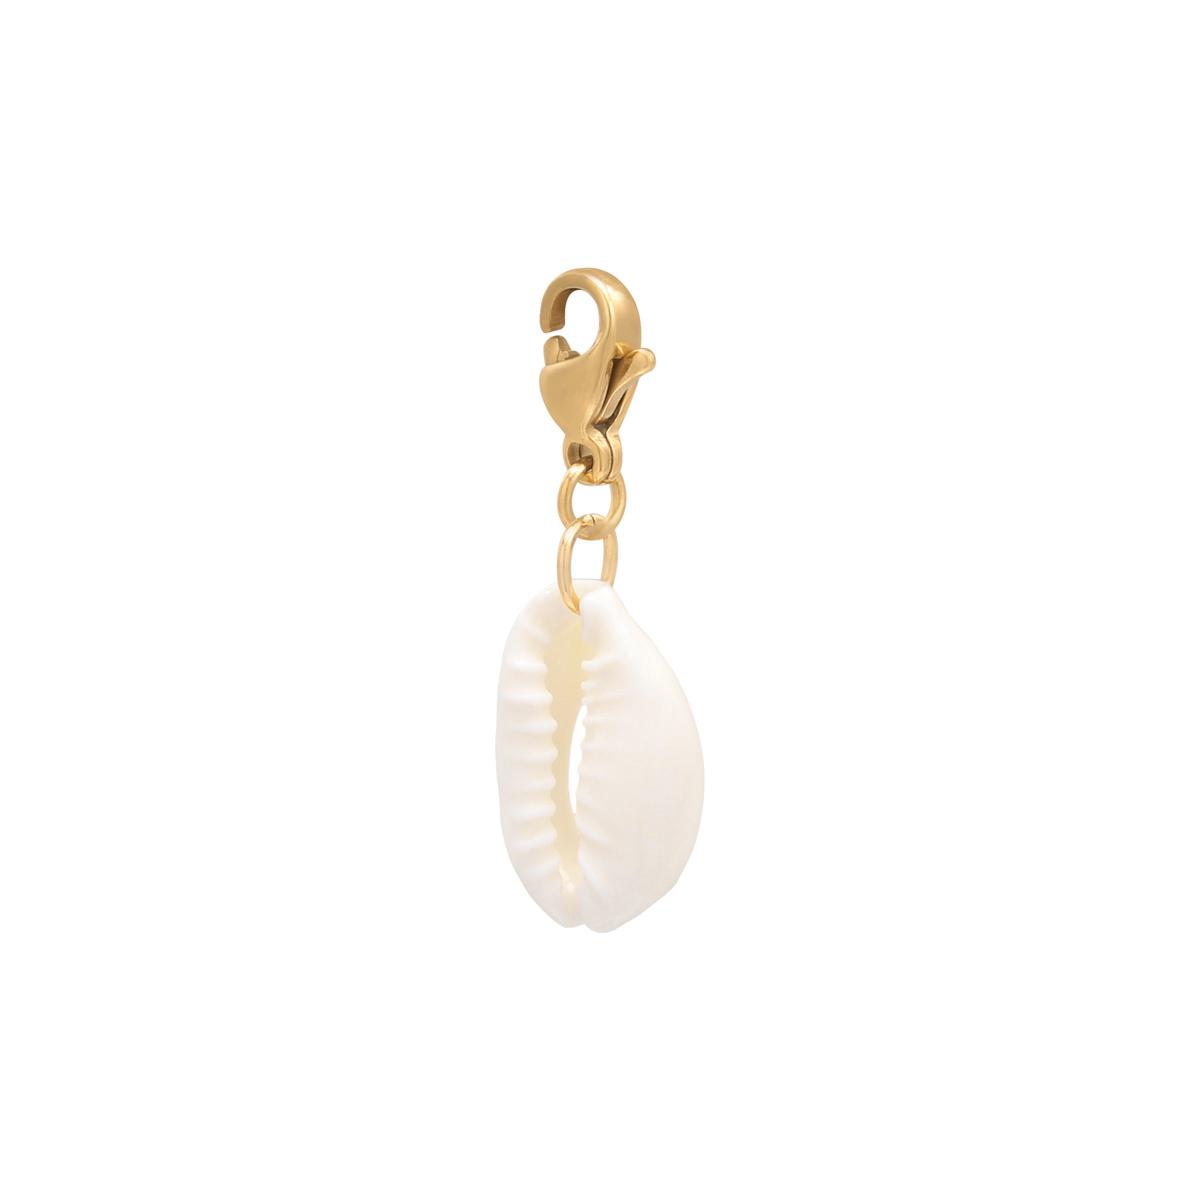 Diy clasp charm shell